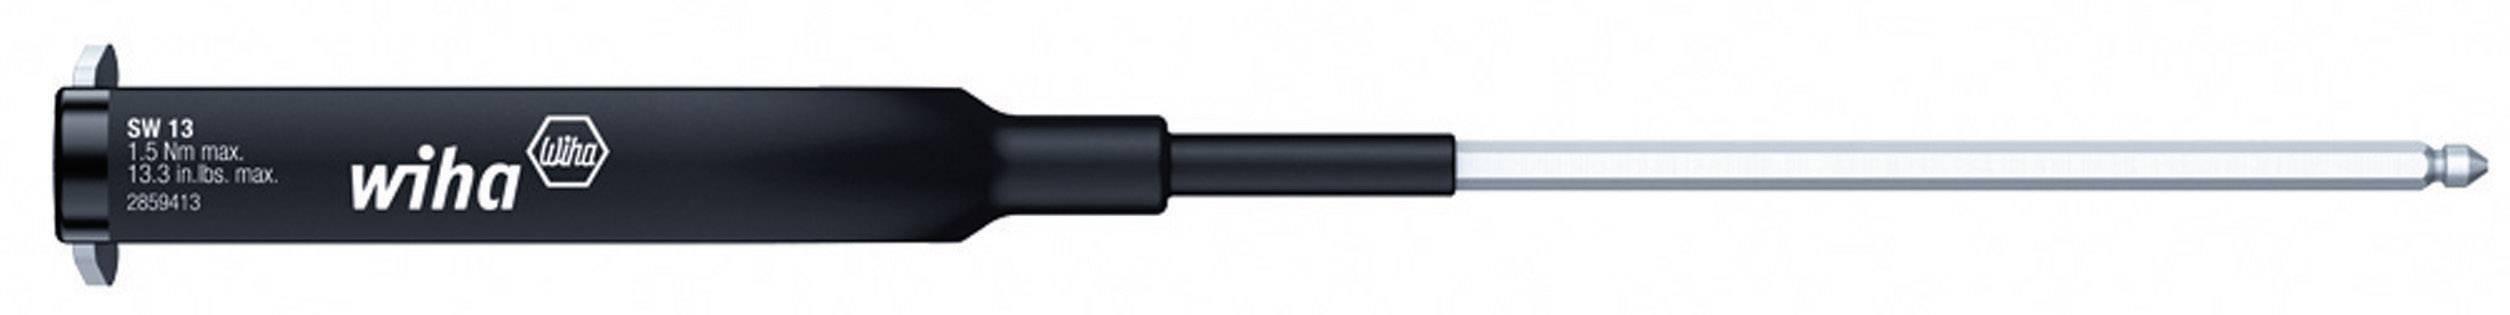 Bit momentového kľúča Wiha Torque 2859 36423, 218 mm